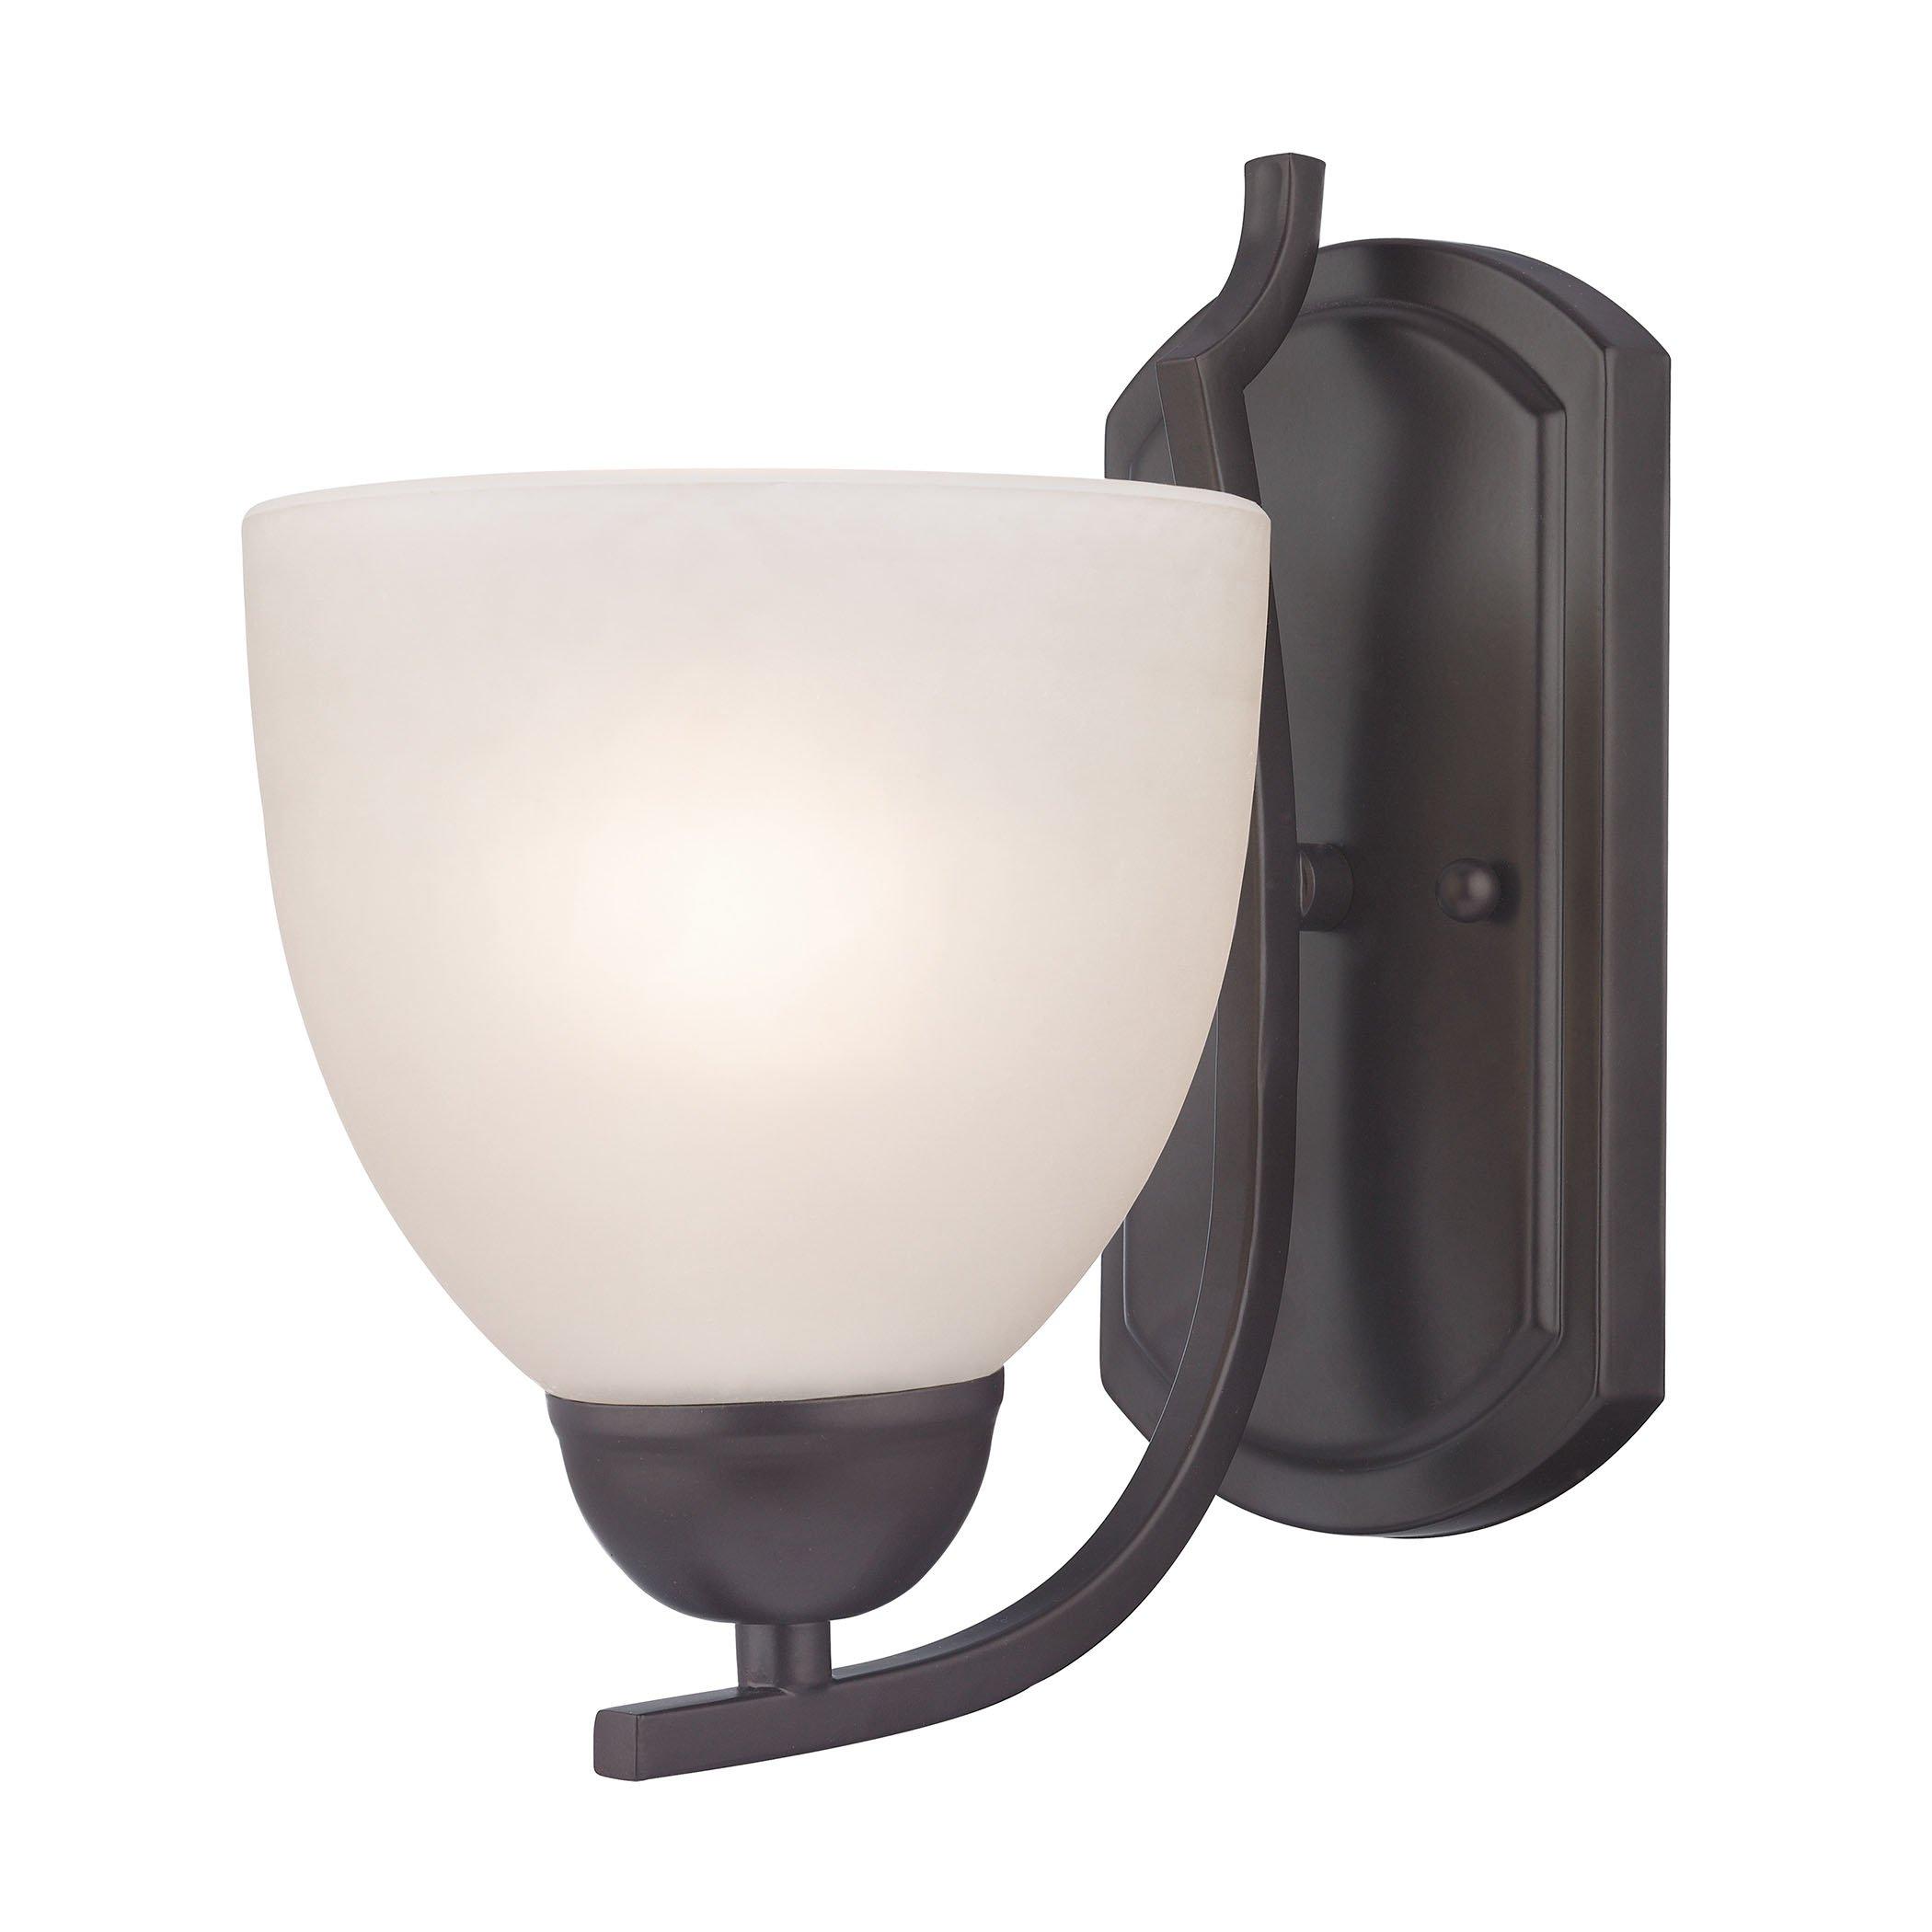 Cornerstone Lighting 1451WS/10 Kingston 1 Light Sconce, Oil Rubbed Bronze